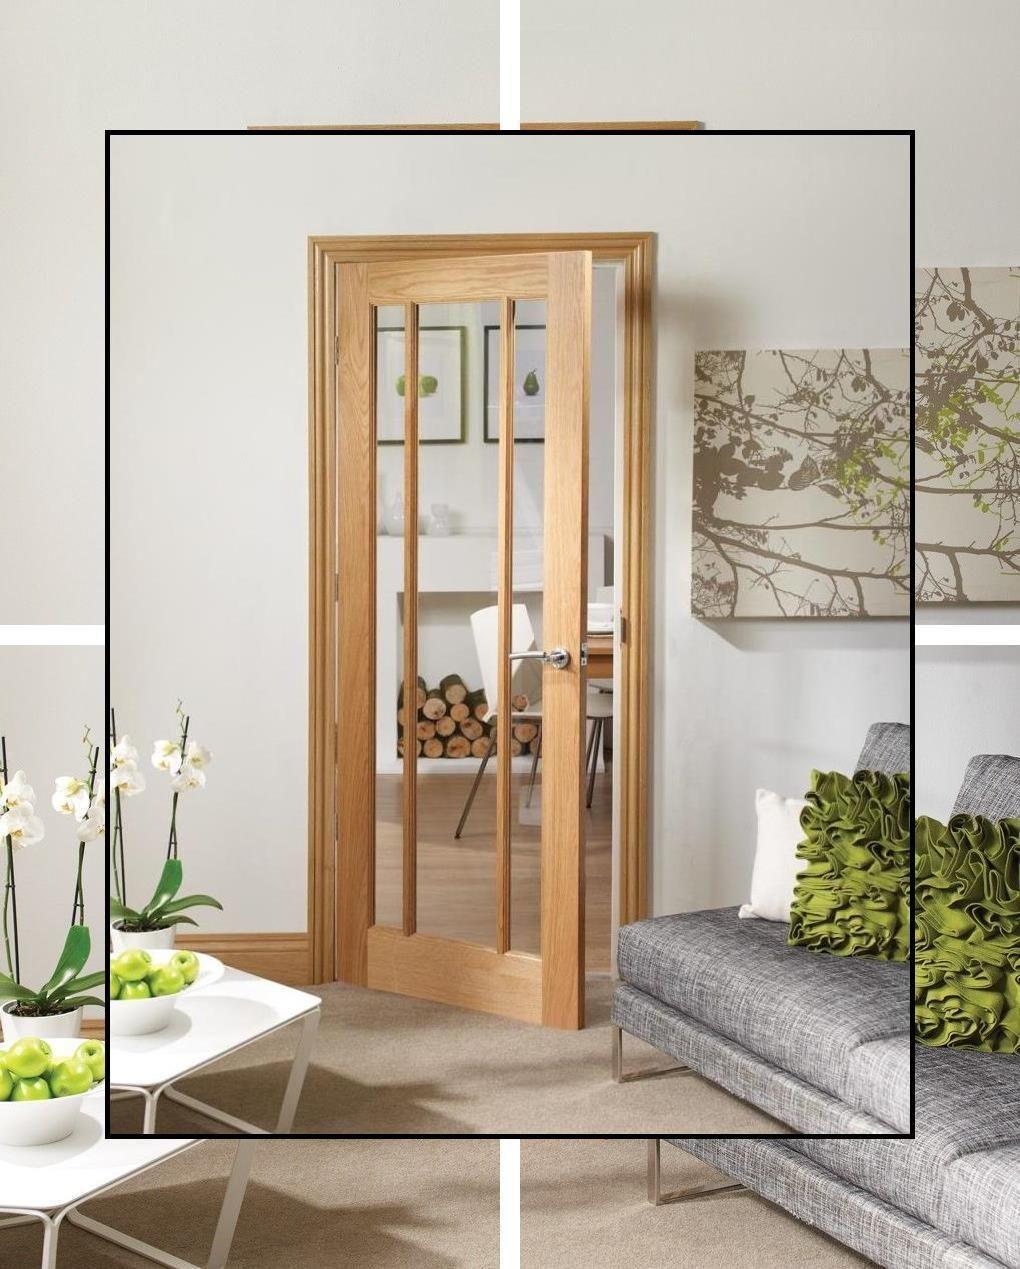 Interior French Doors Interior French Doors With Side Panels